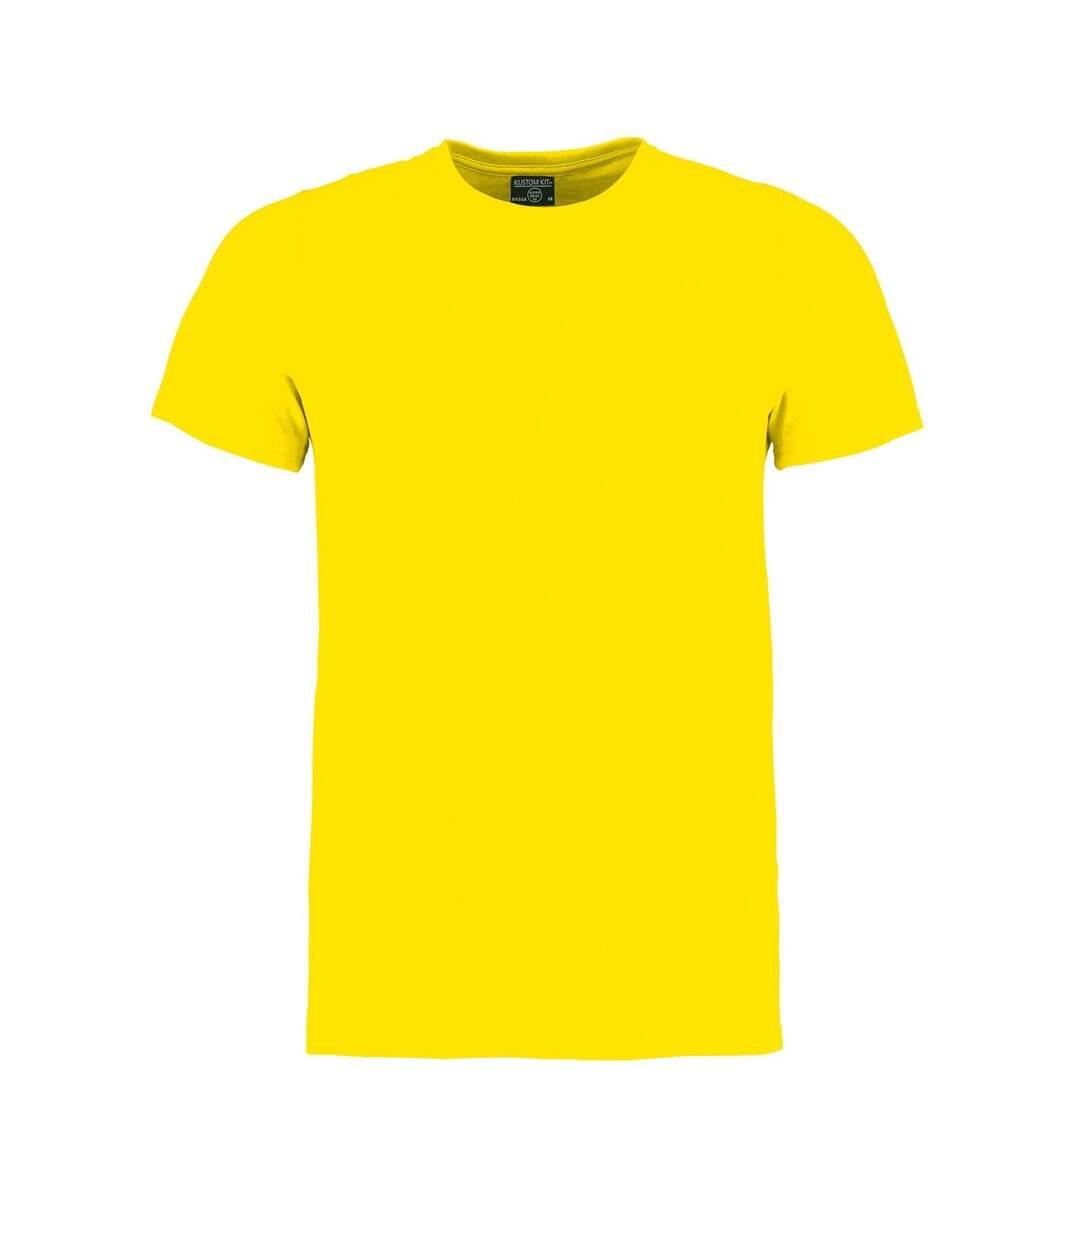 Kustom Kit Mens Superwash 60 Fashion Fit T-Shirt (Bright Yellow Marl) - UTBC3729